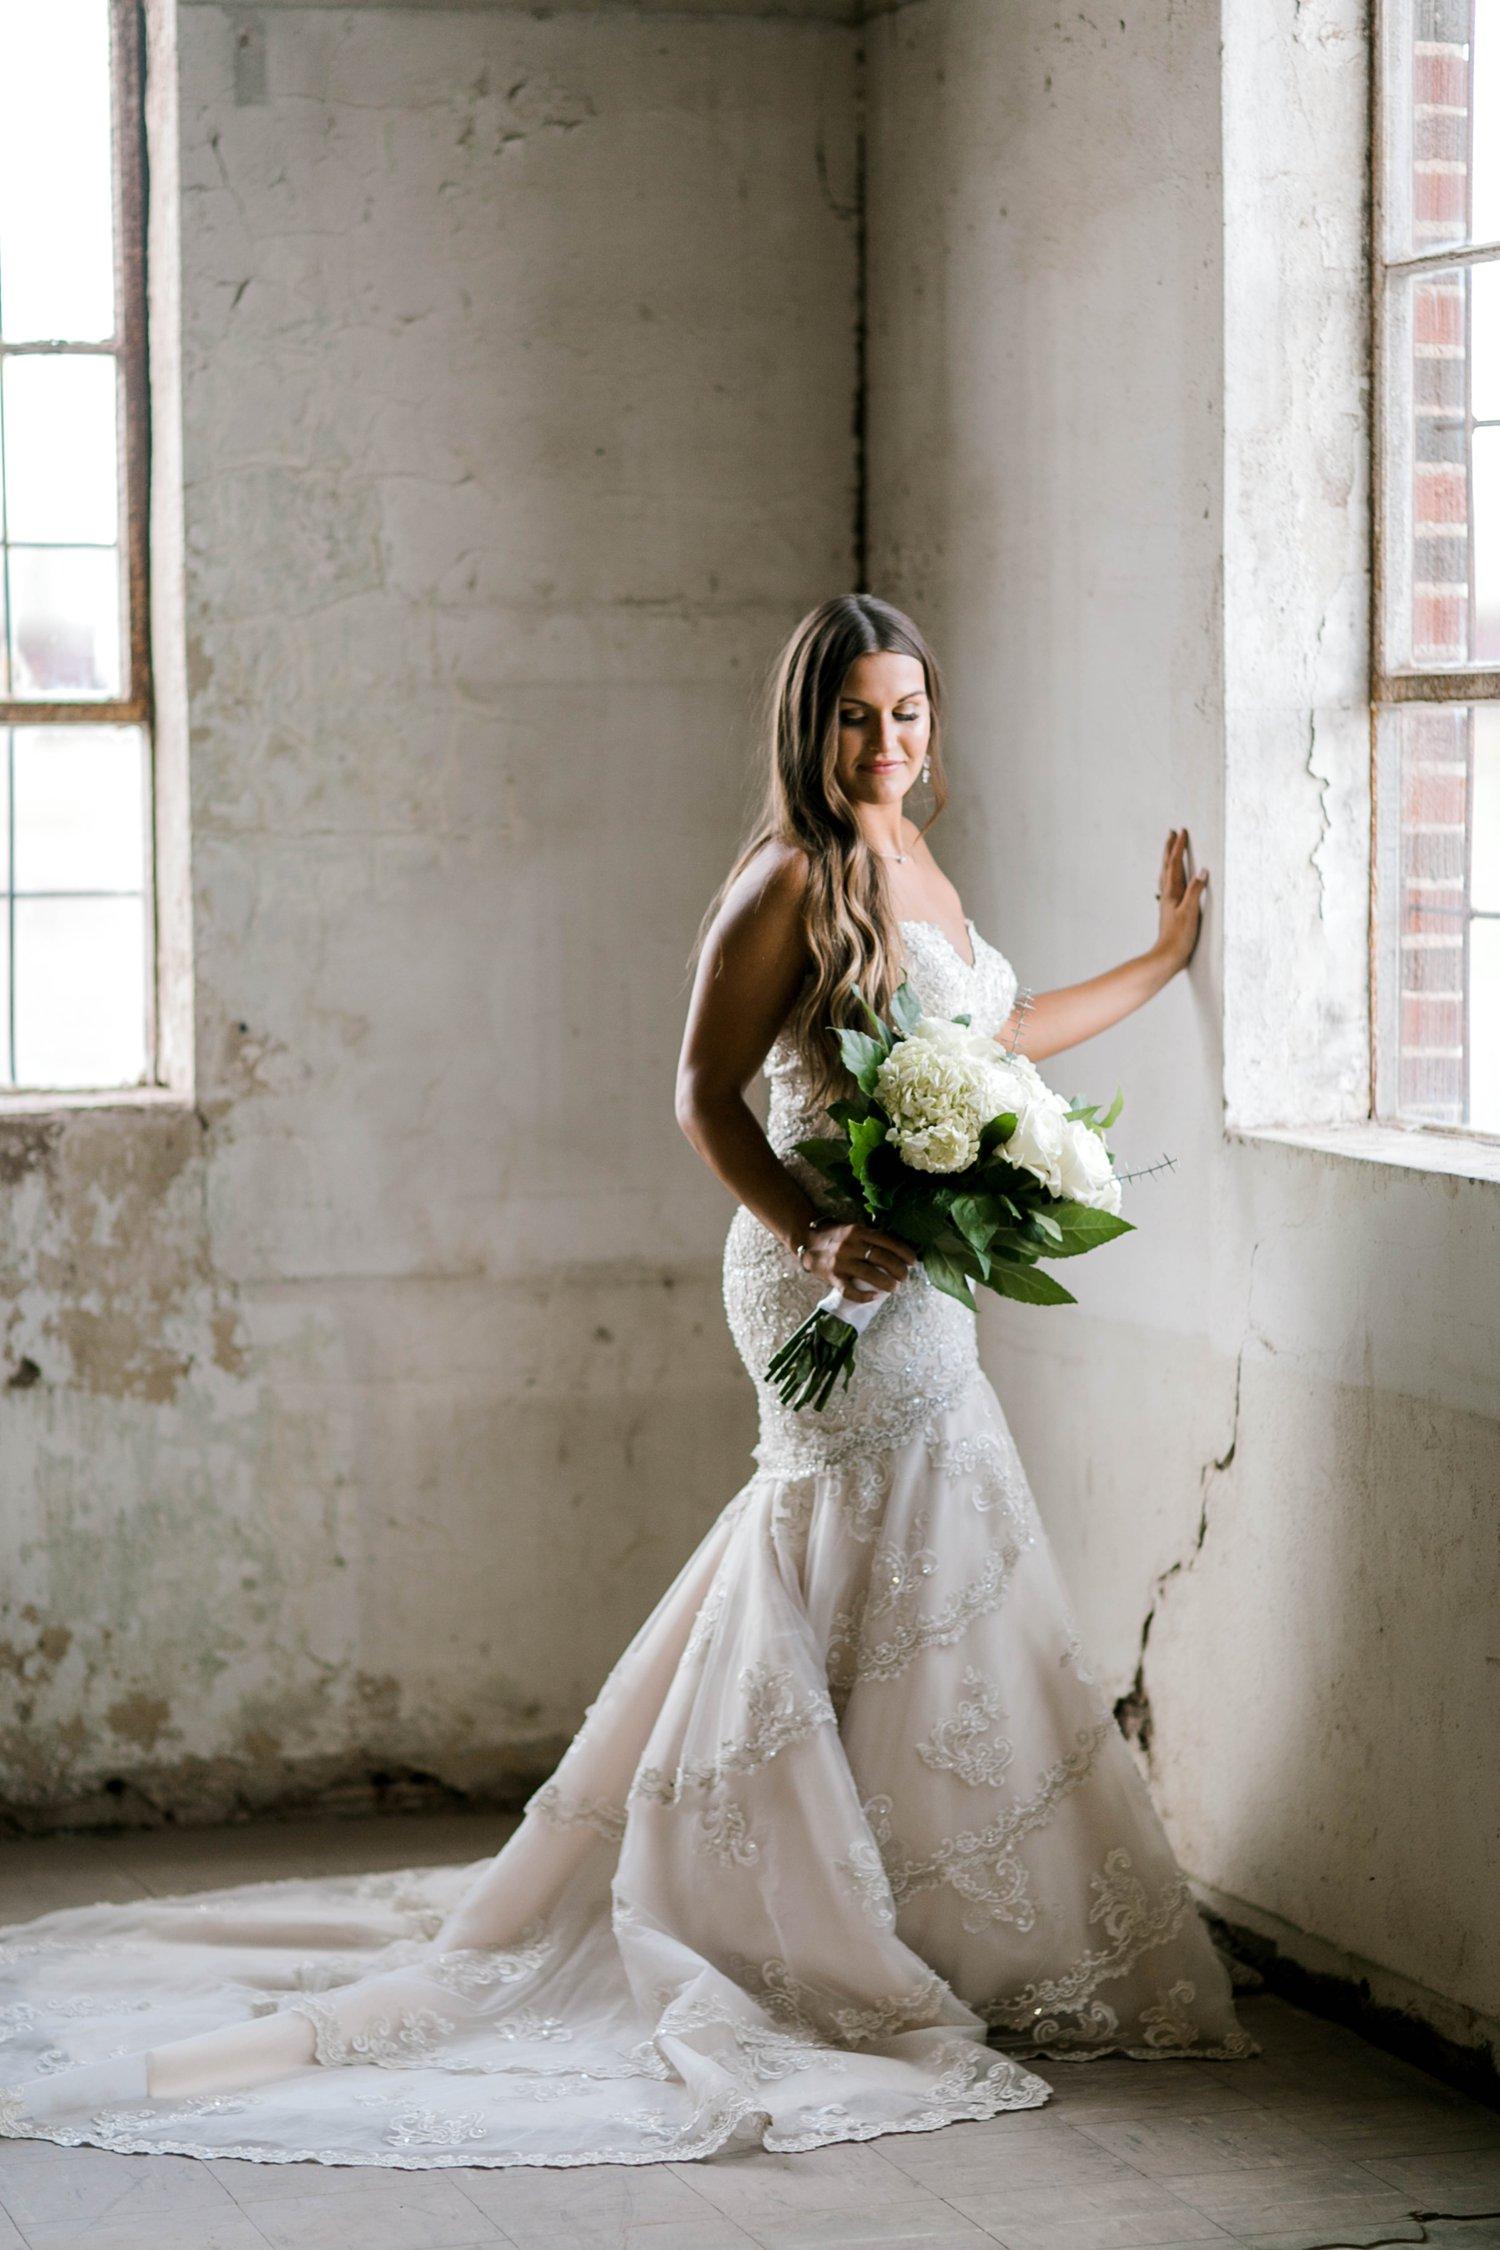 Kendra_Hill_Bridals_ALLEEJ_Lubbock_Wedding_Photographer_LHUCA_0028.jpg